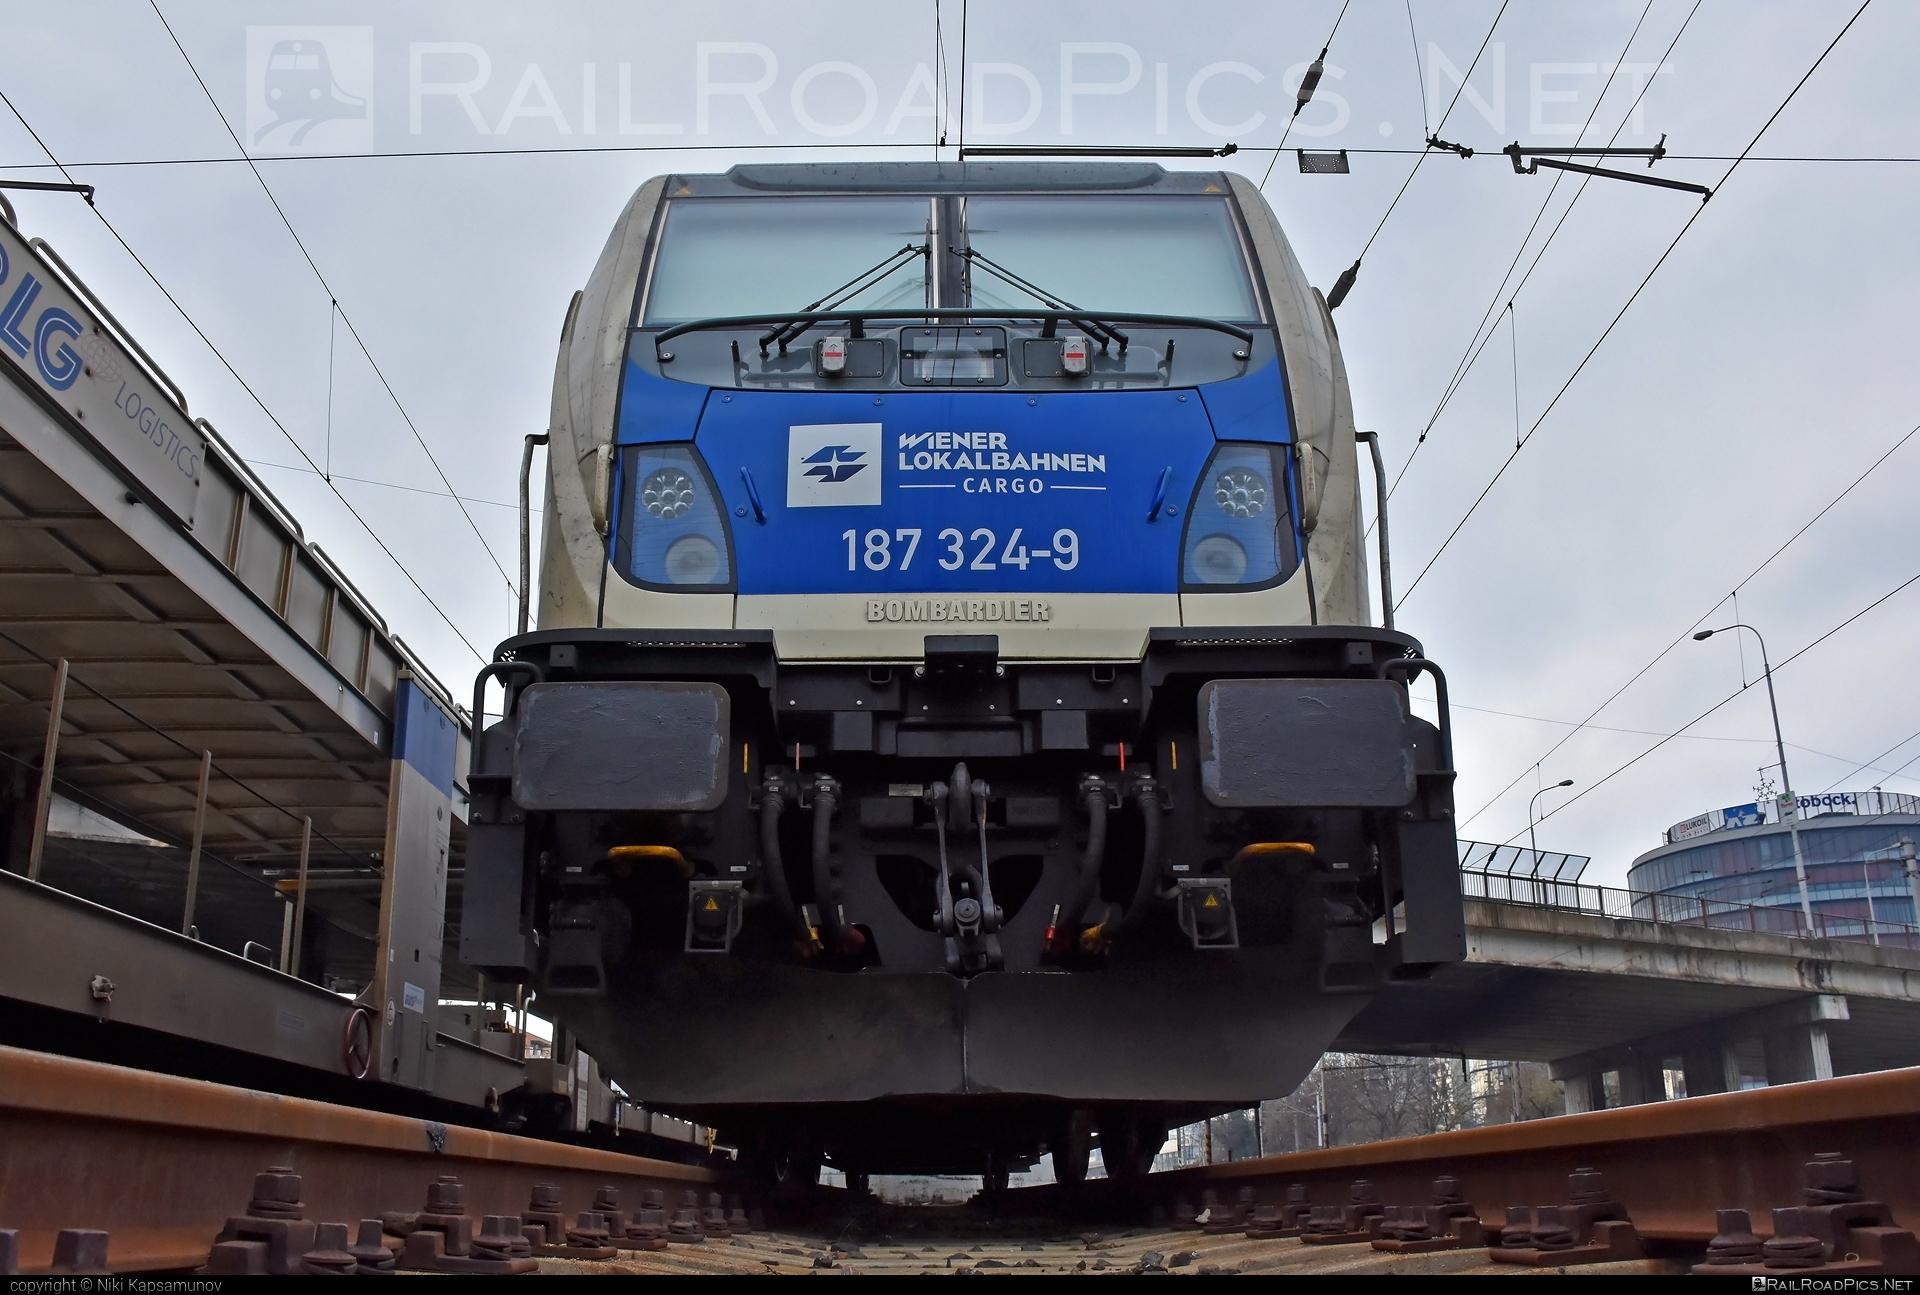 Bombardier TRAXX F160 AC3 - 187 324-9 operated by Salzburger Eisenbahn Transportlogistik GmbH #SalzburgerEisenbahnTransportlogistik #SalzburgerEisenbahnTransportlogistikGmbH #bombardier #bombardiertraxx #setg #traxx #traxxf160 #traxxf160ac #traxxf160ac3 #wienerlokalbahnencargo #wienerlokalbahnencargogmbh #wlc